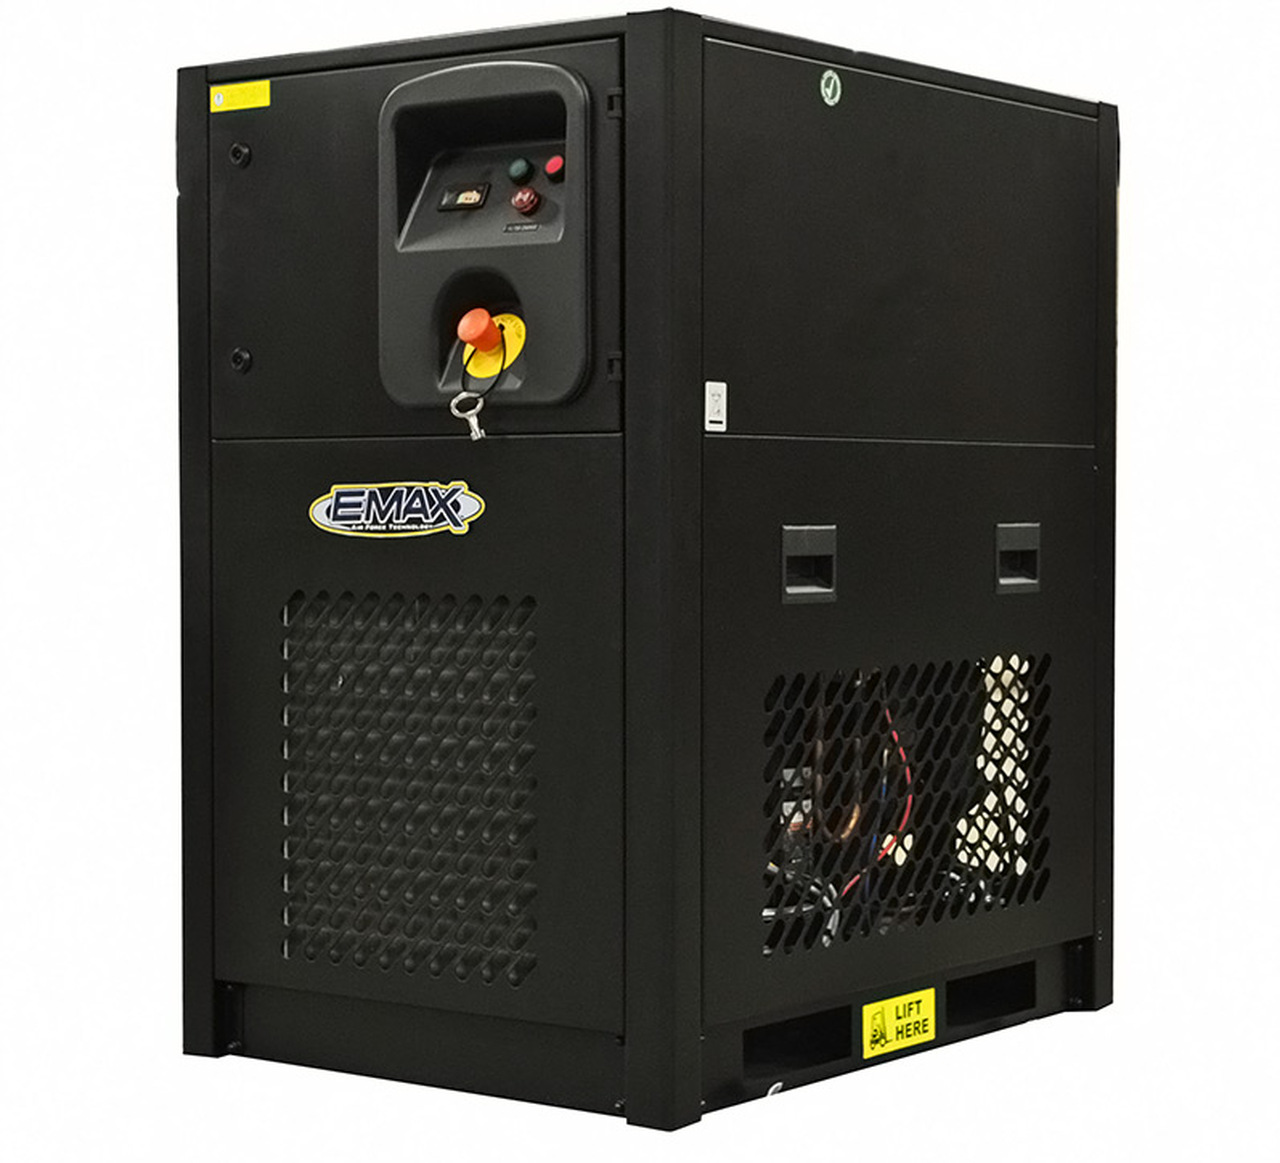 EMAX EDRCF4600575 575 CFM Refrigerated Air Dryer 460 Volt Three Phase